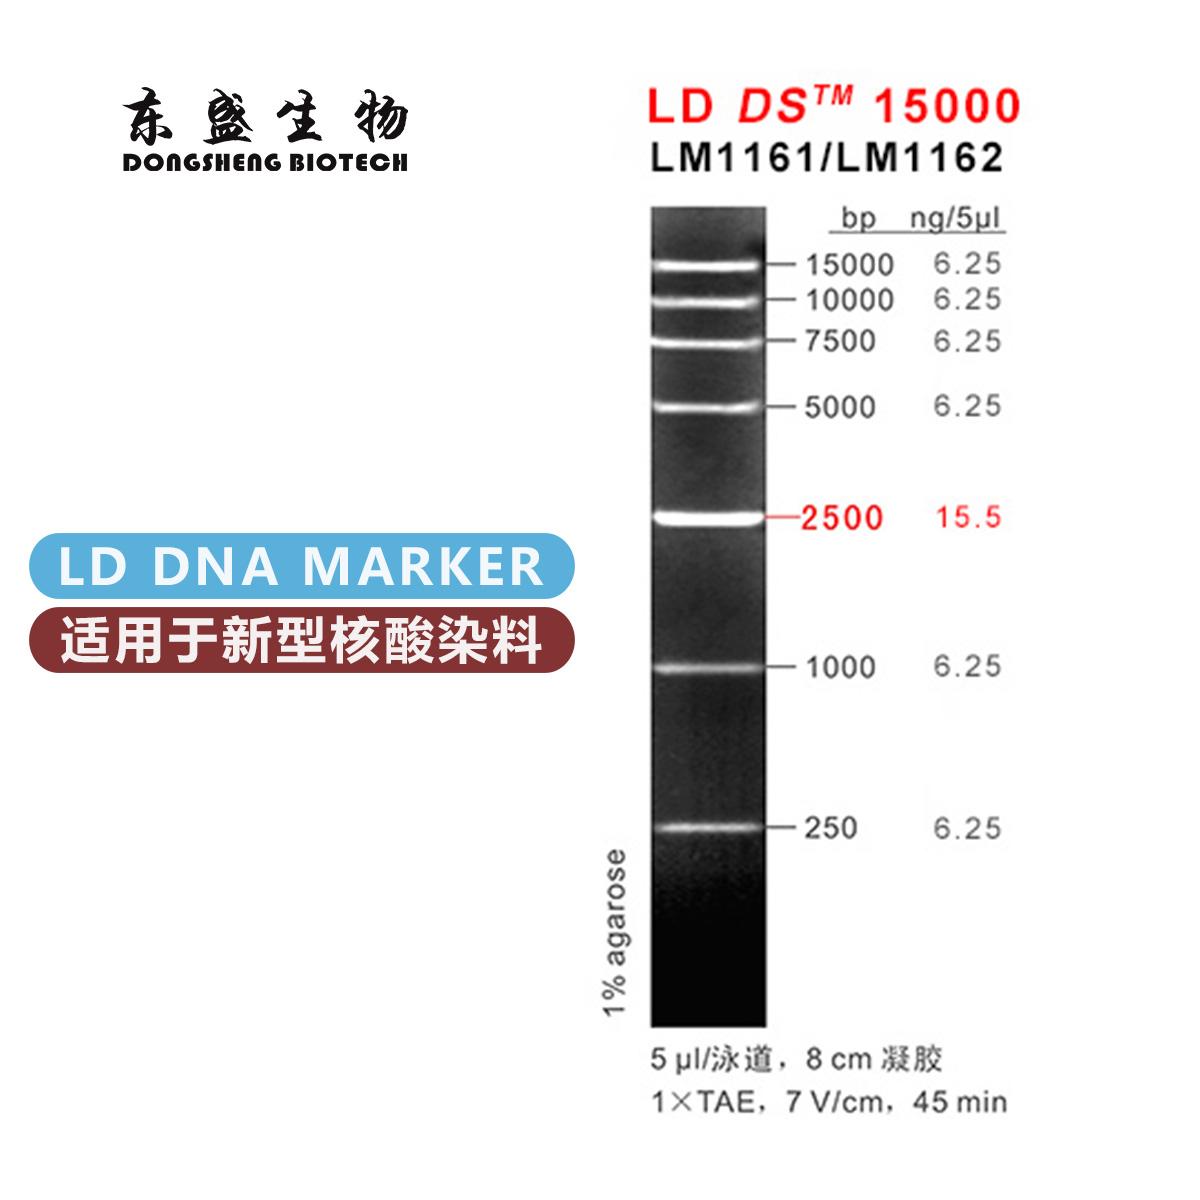 东盛LD DS15000 新型染料专用DNA Marker (LM1161-LM1162)